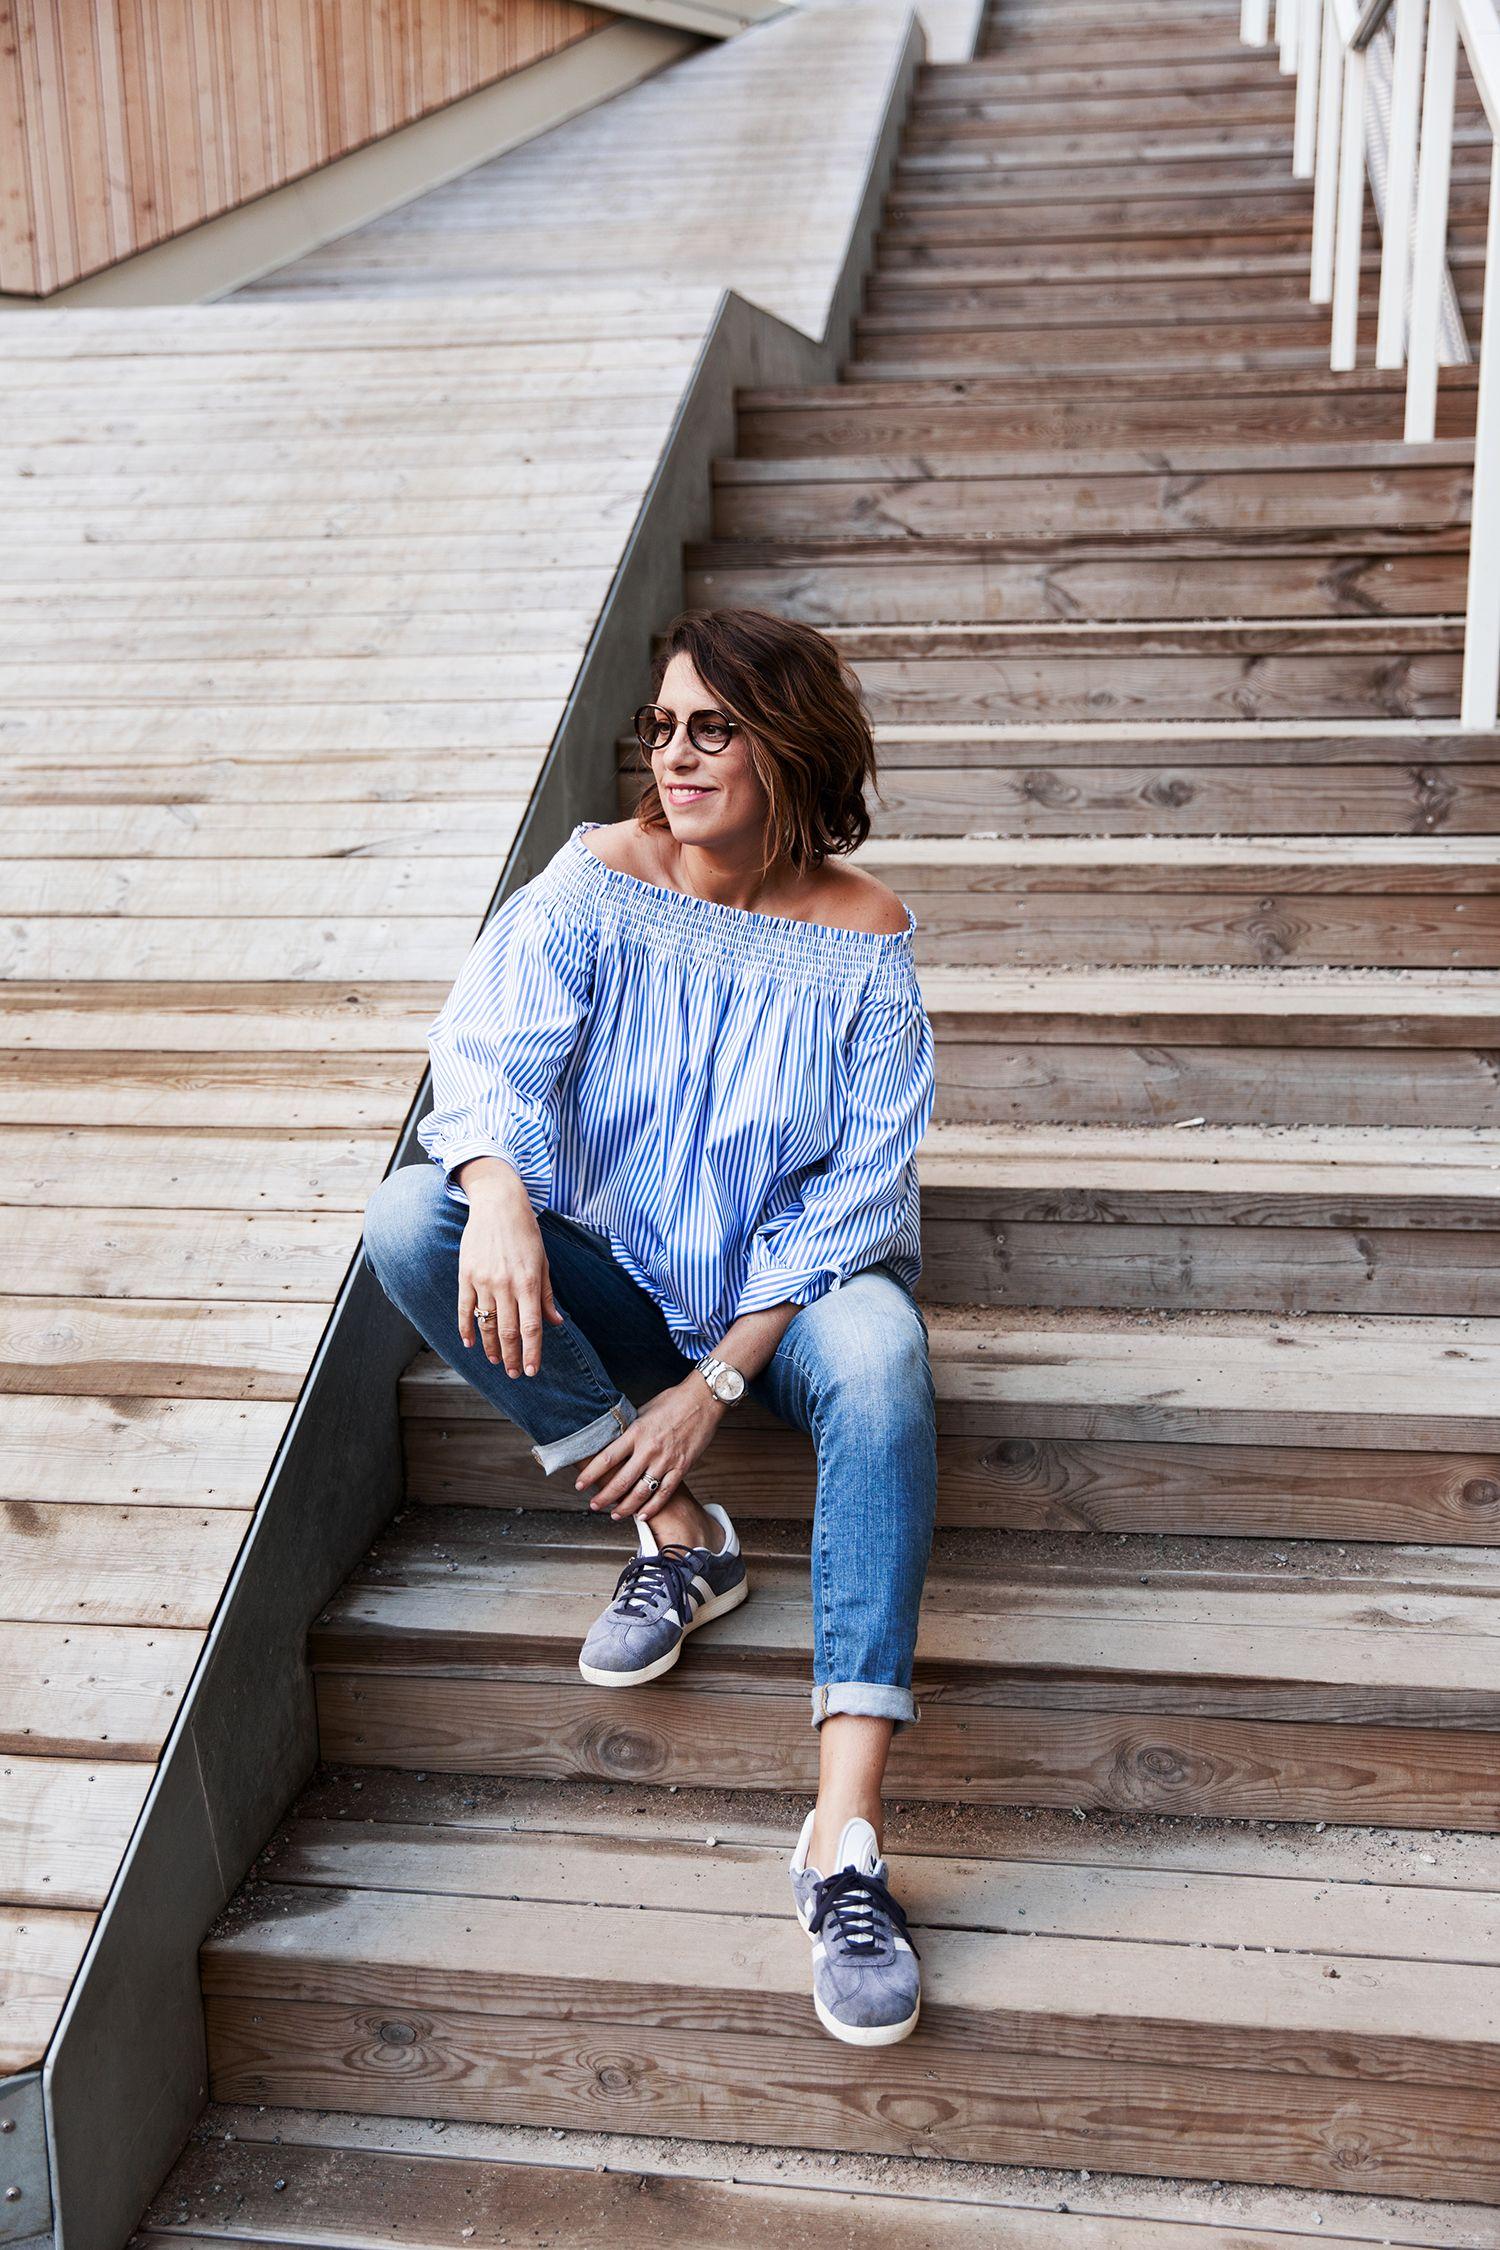 OOTD (med bilder) | Modebloggare, Gravid mode